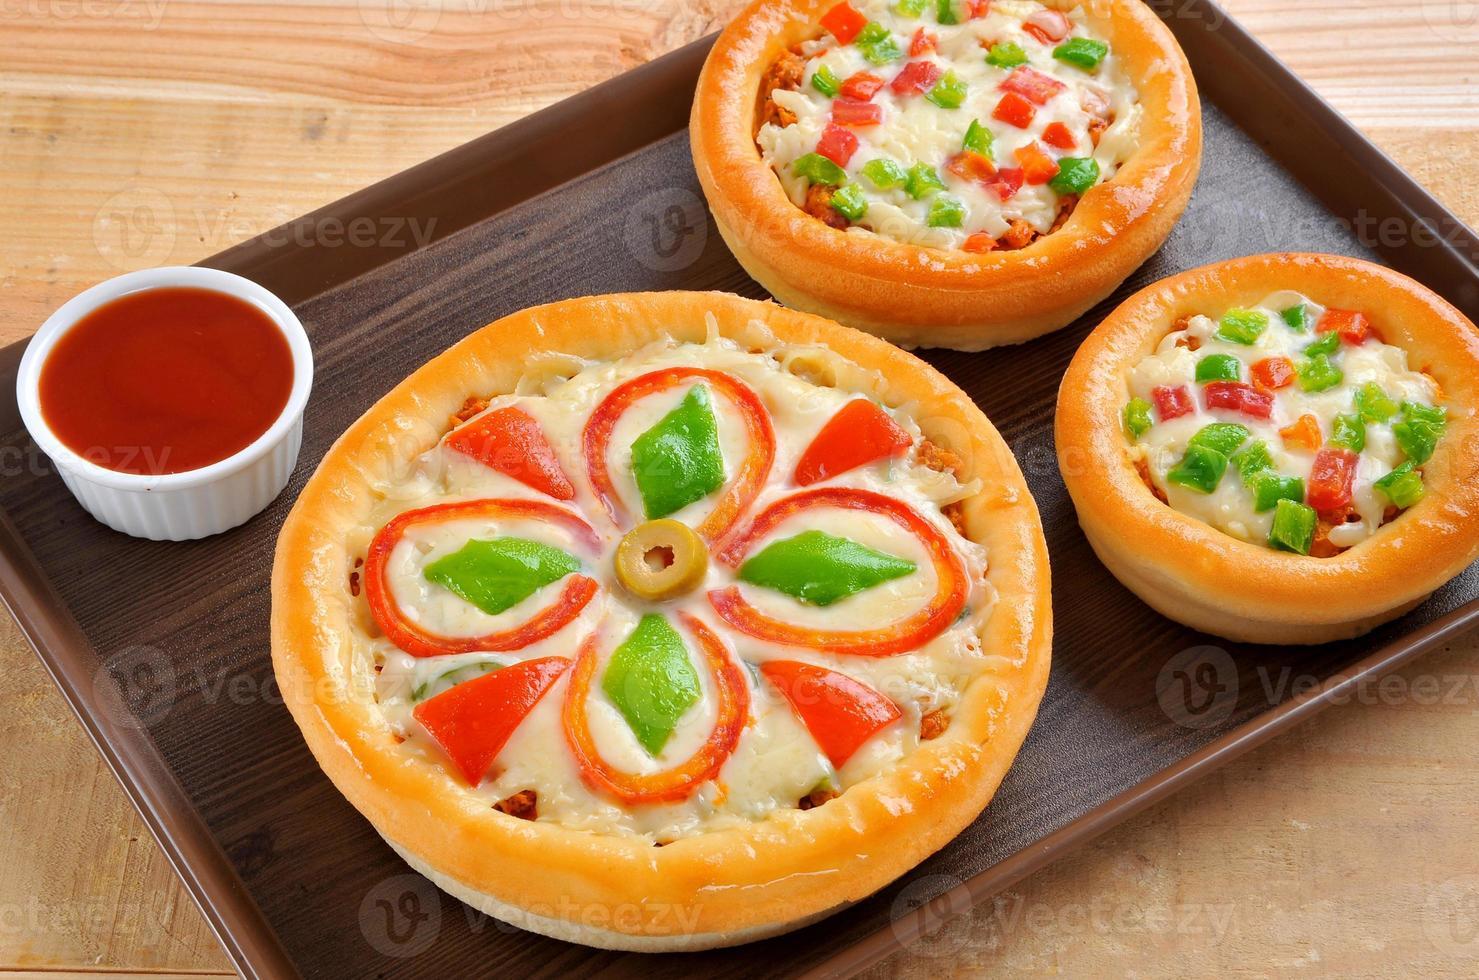 bageripizza-4 foto